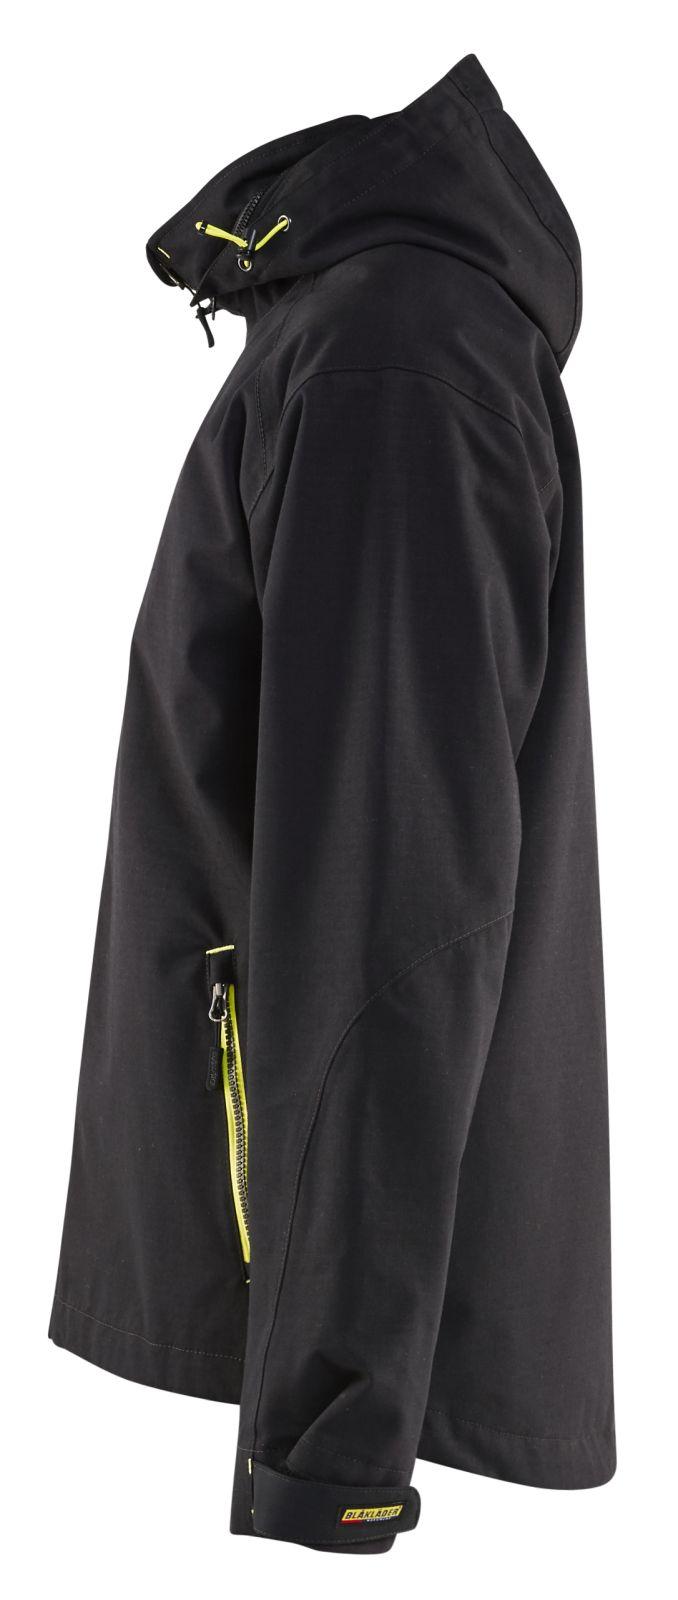 Blaklader Regenjacks 48681938 zwart-geel(9933)